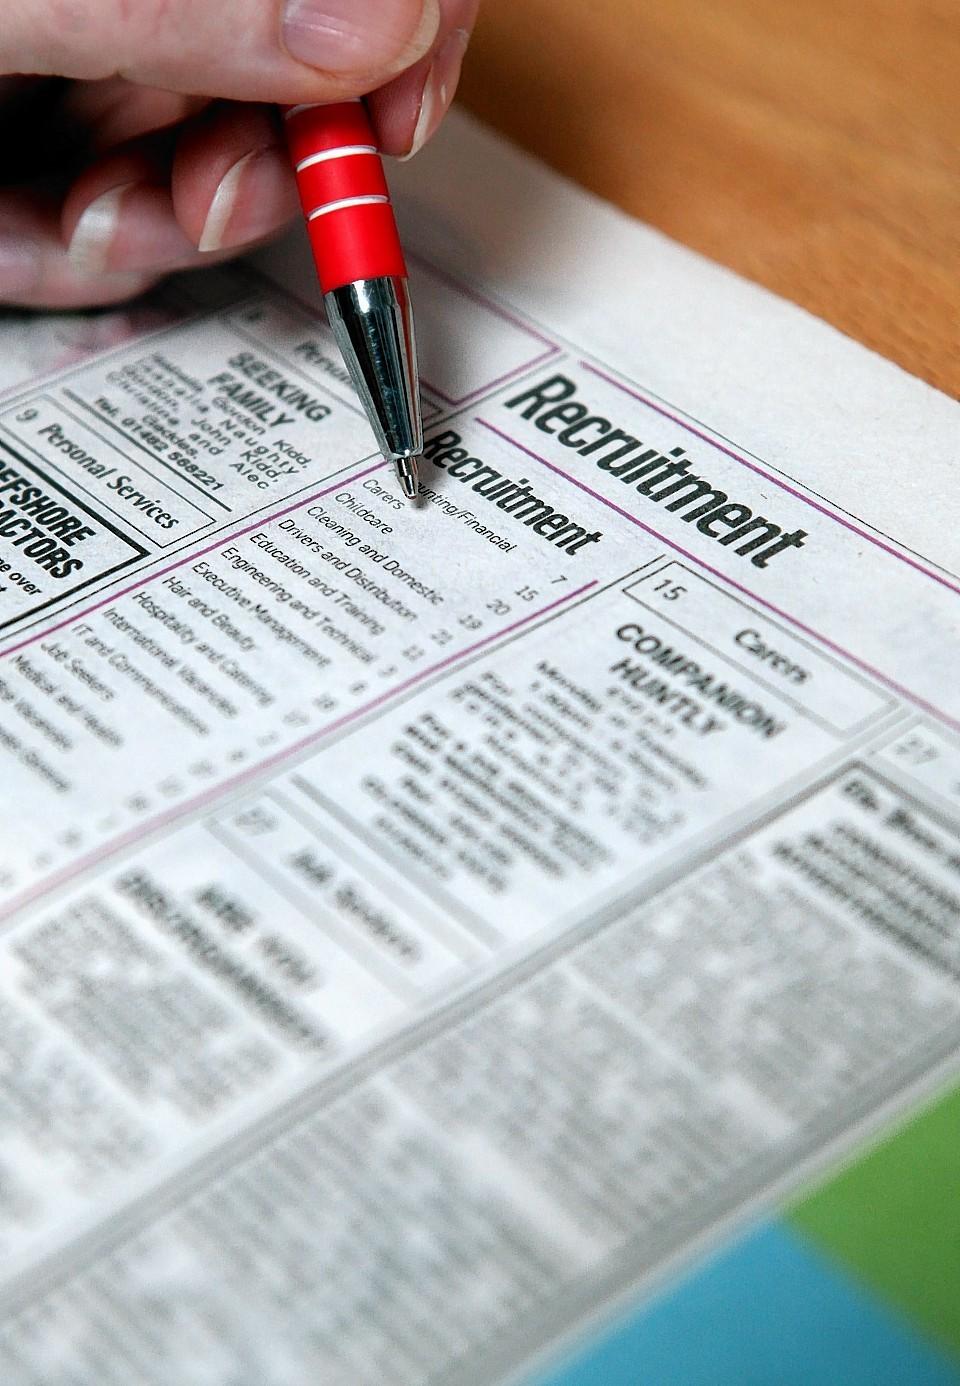 Shock job losses at Brora call centre | Press and Journal